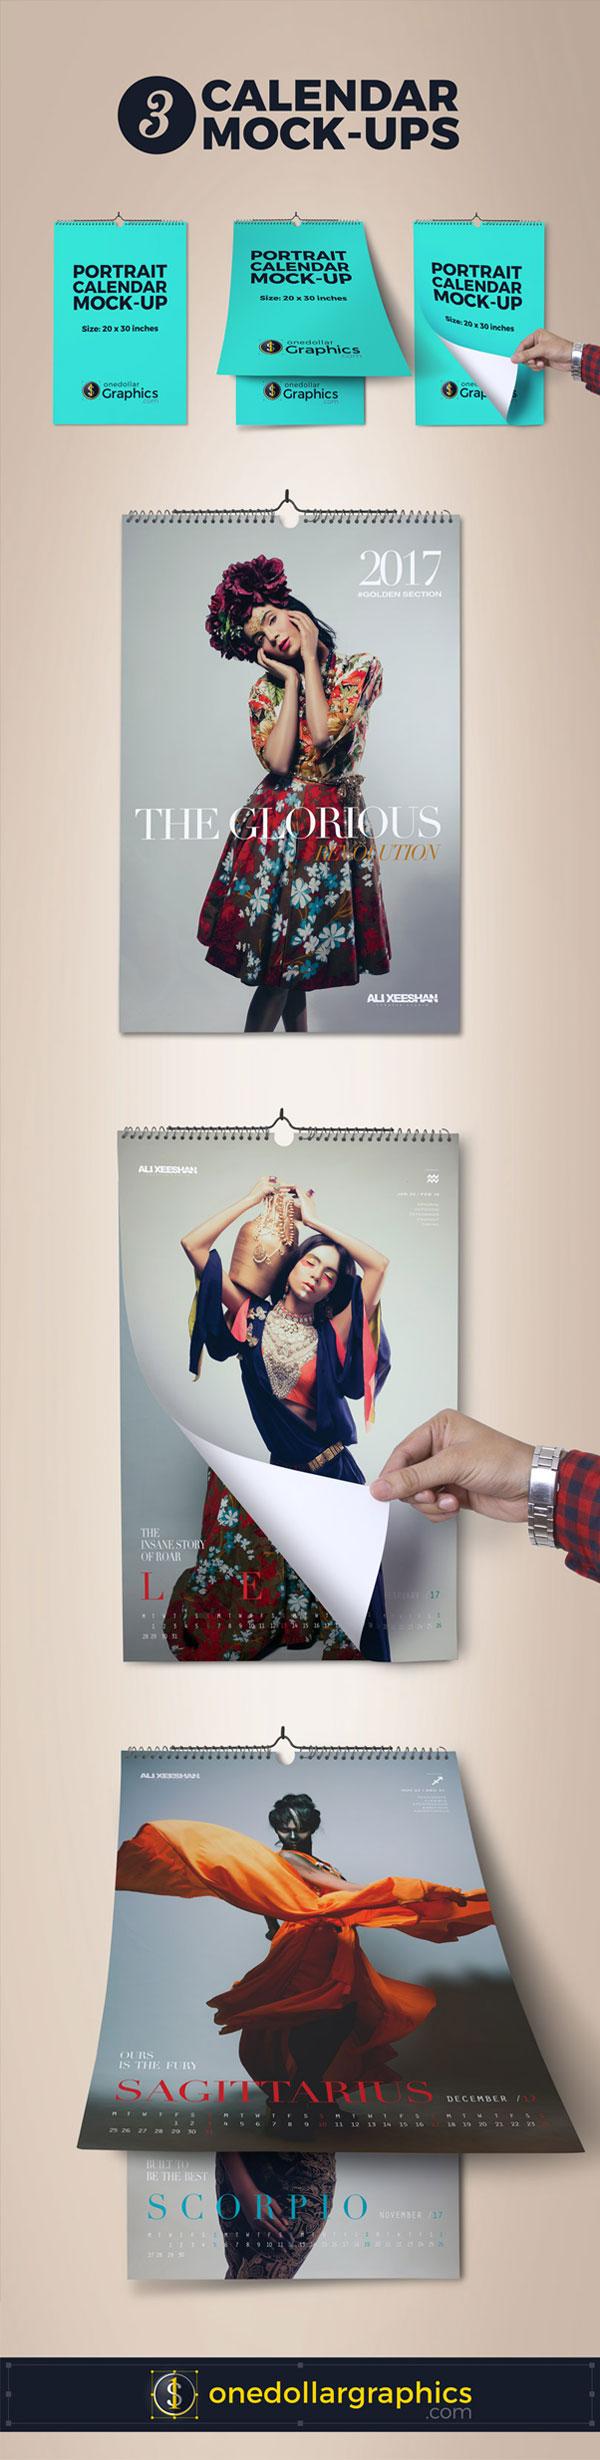 12-zodiac-signs-fashion-wall-calendar-design-template-2017-mock-up-psd-files